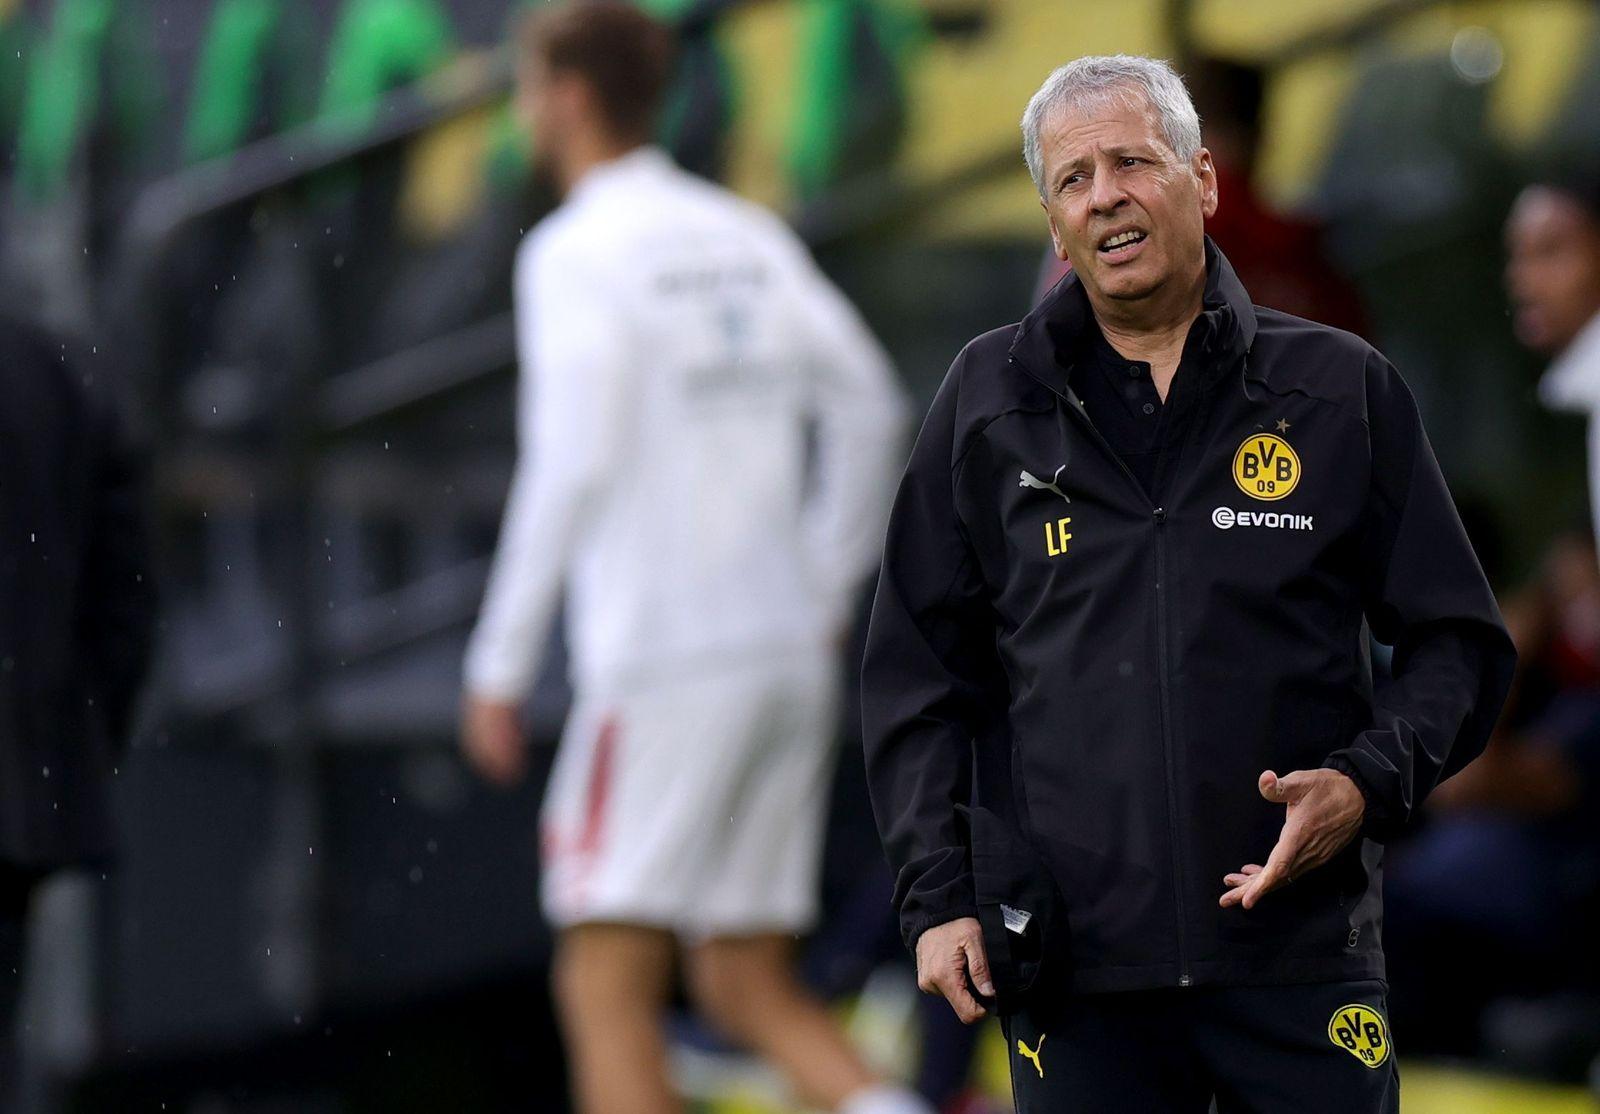 Borussia Dortmund vs 1. FSV Mainz 05, Germany - 17 Jun 2020